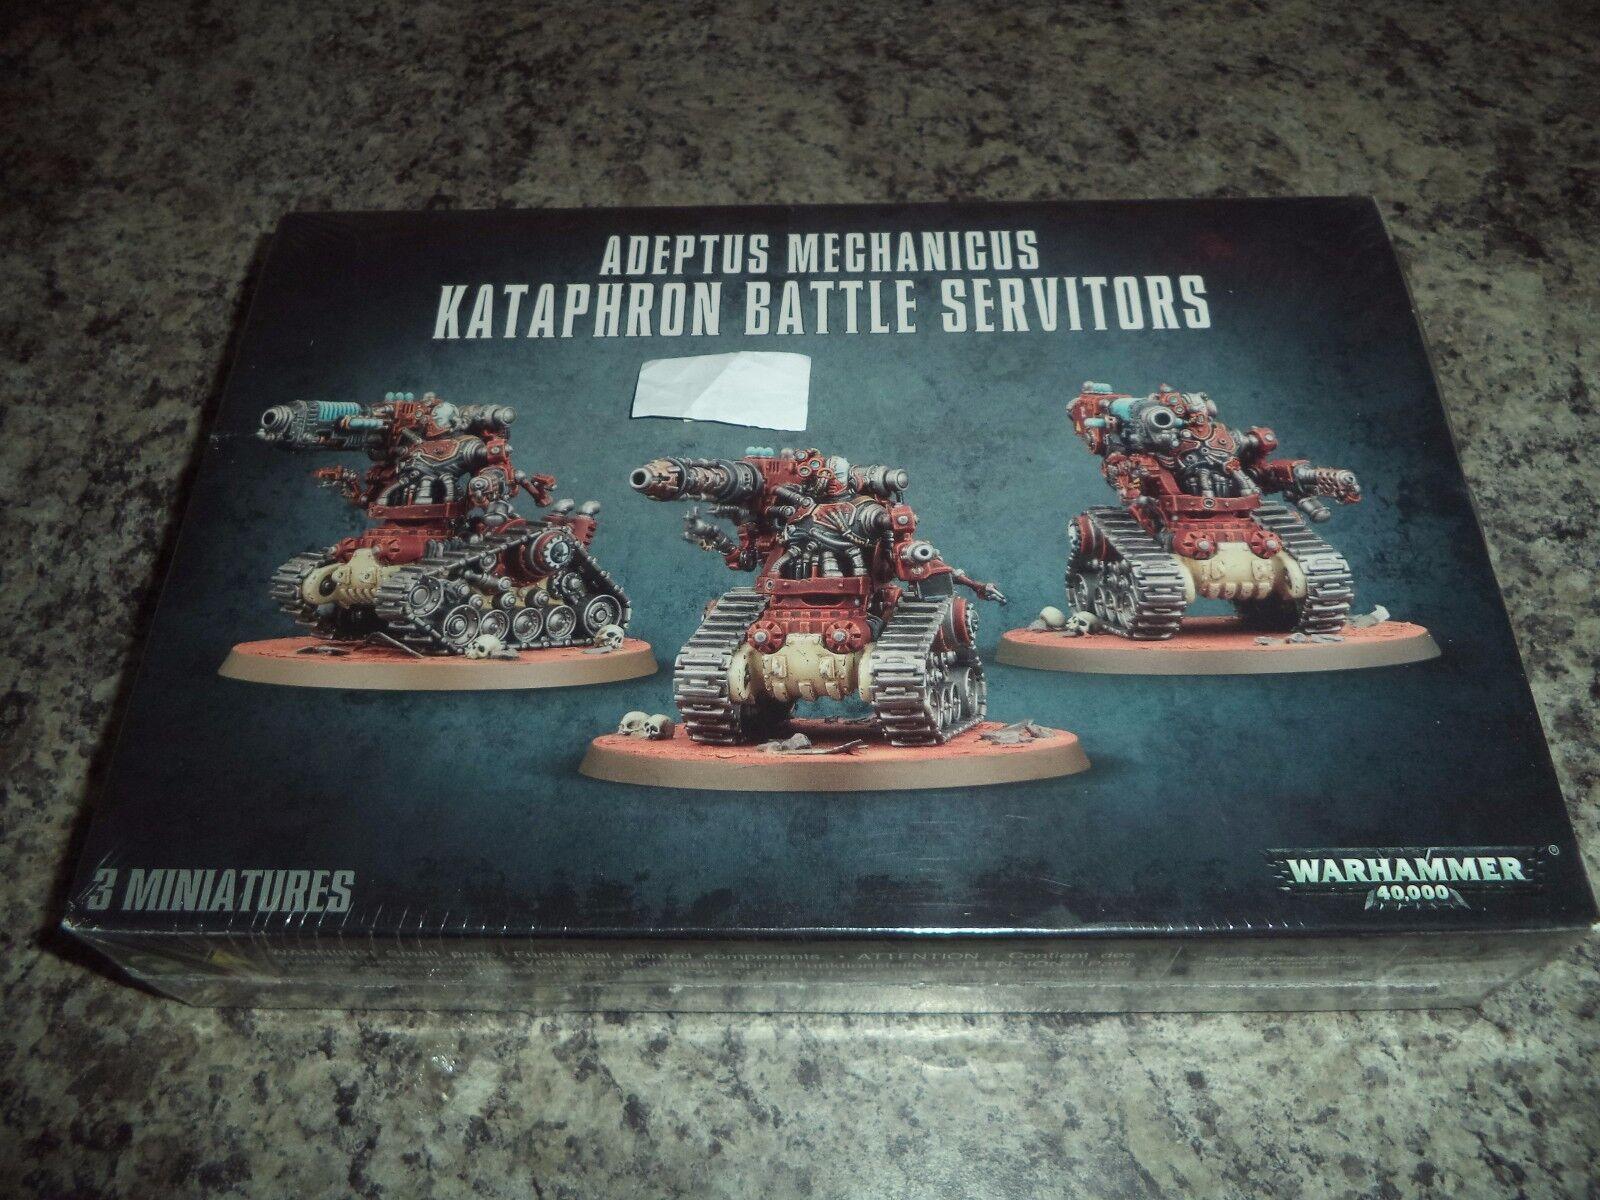 Kataphron Battle Servitors - Warhammer 40k 40,000 Games Workshop Model New